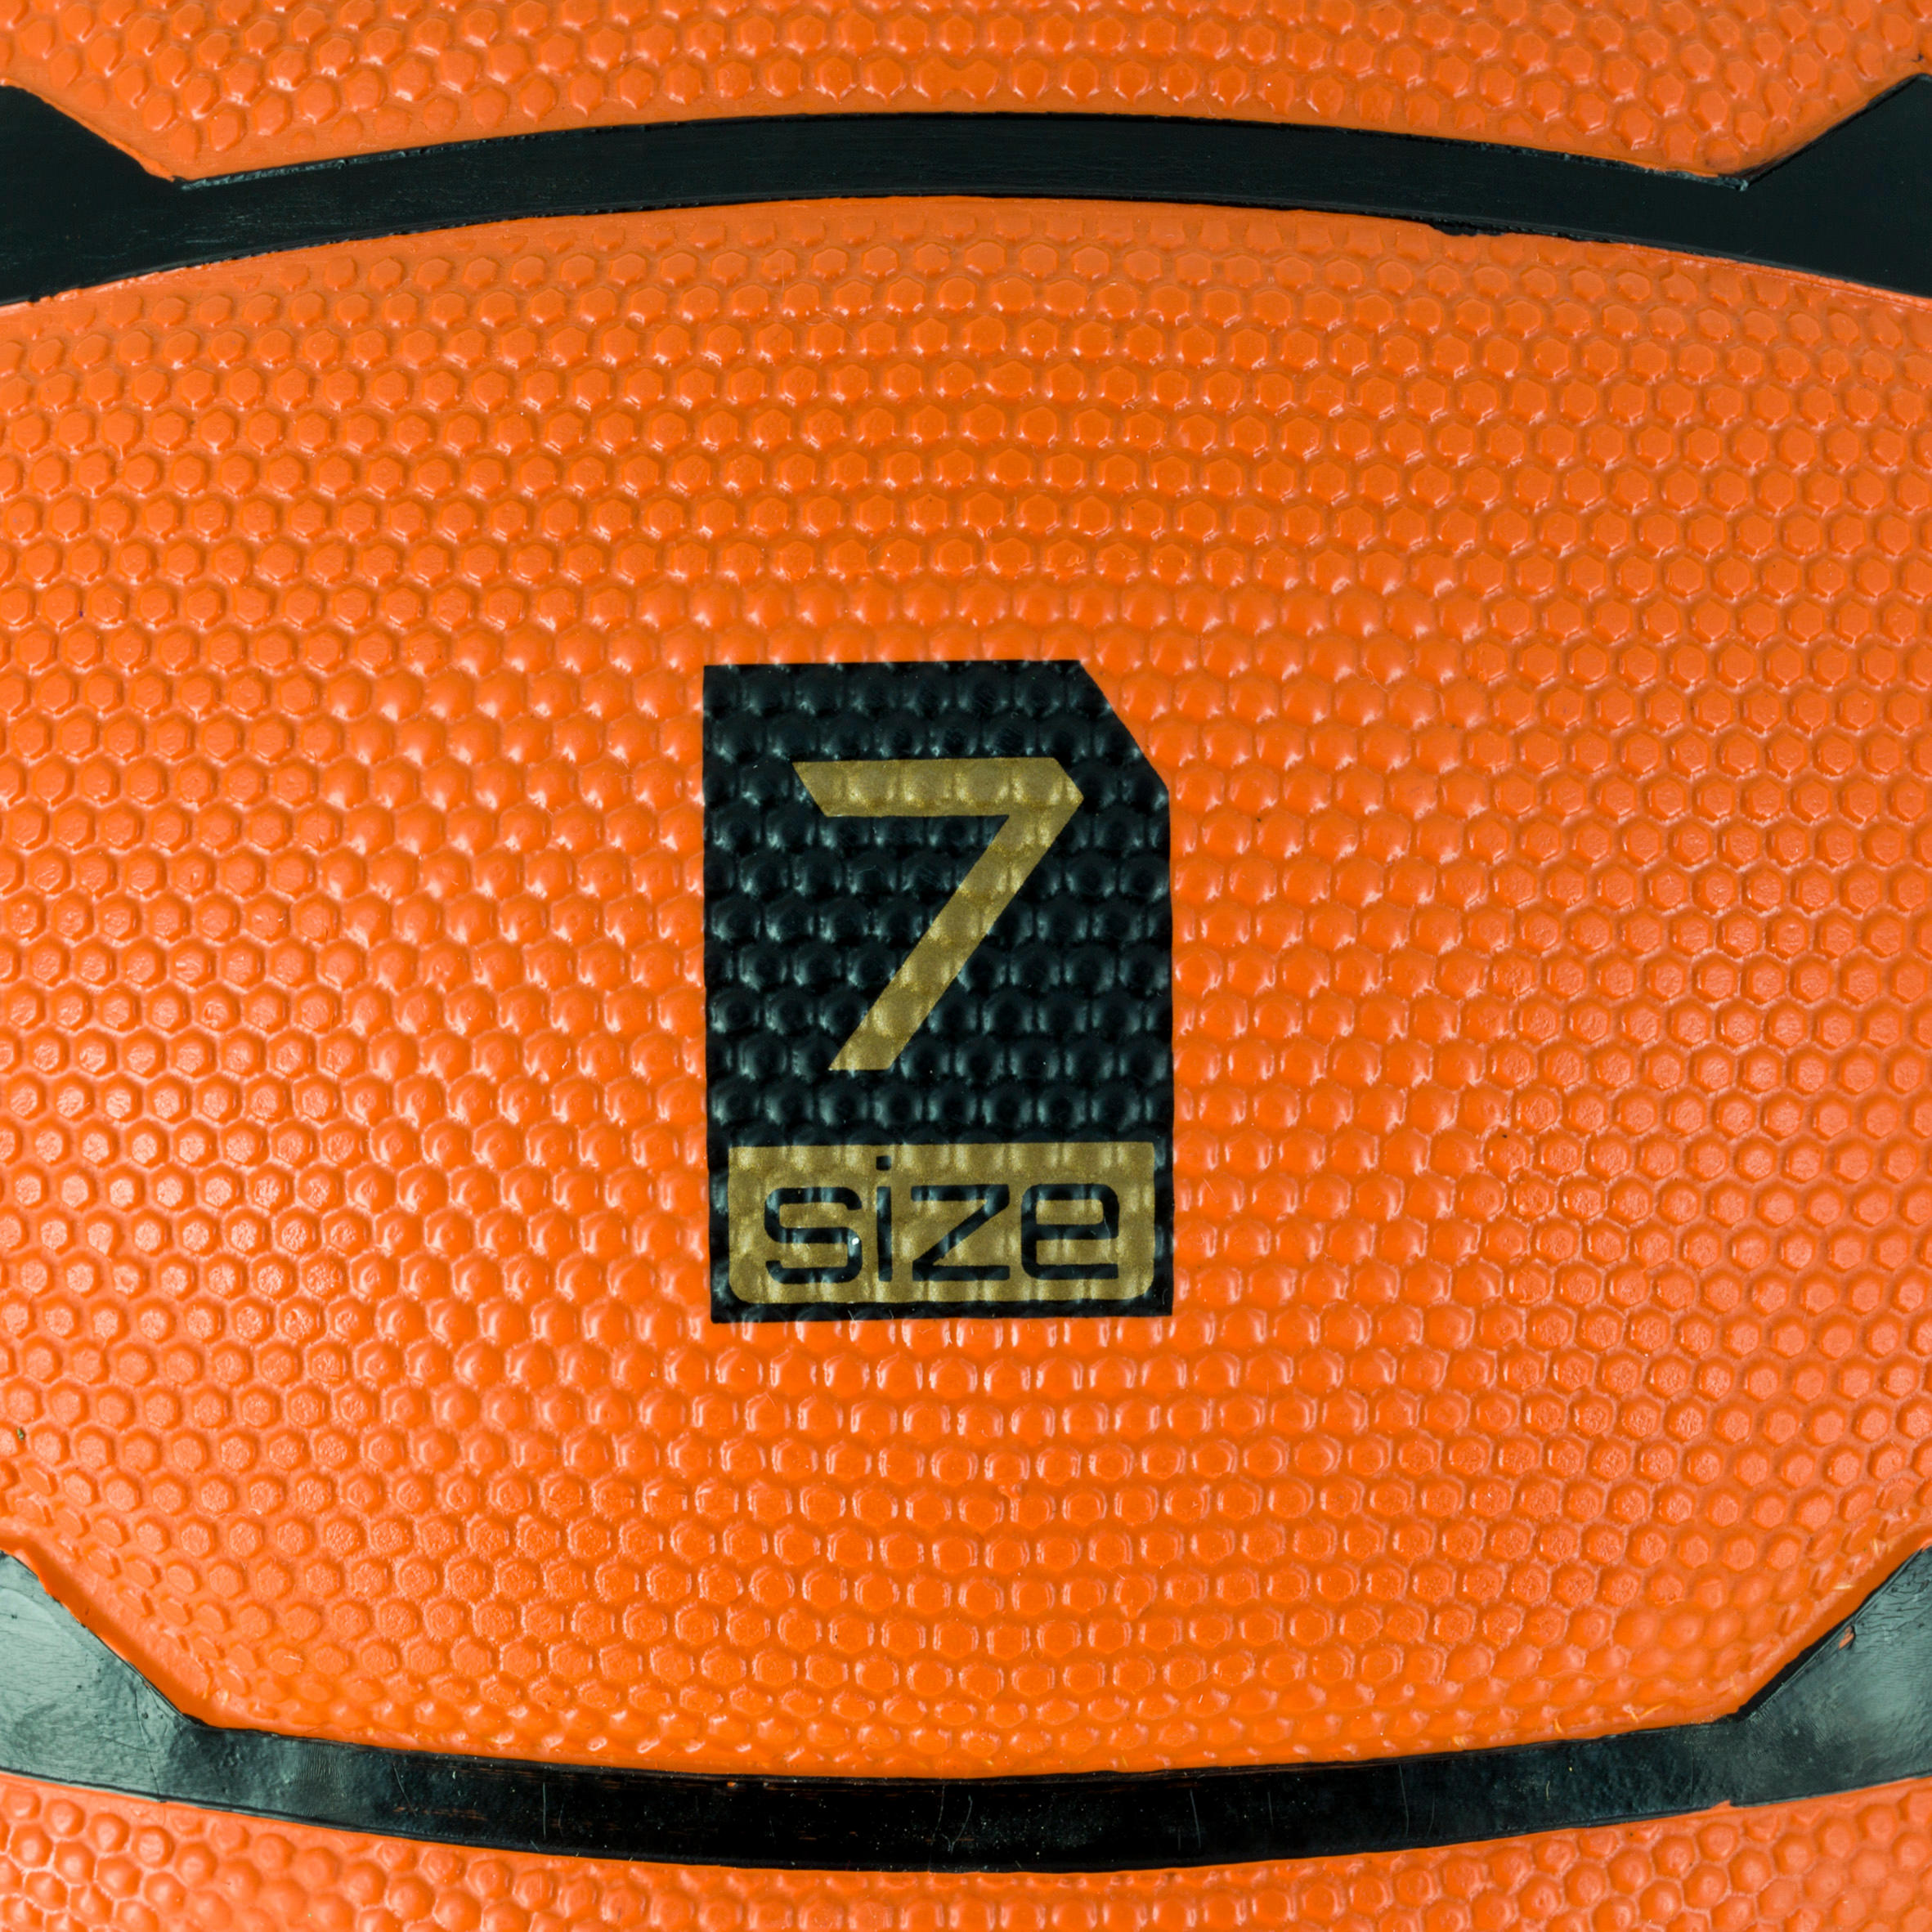 Ballon de basketball adulte B300 taille 7 orange